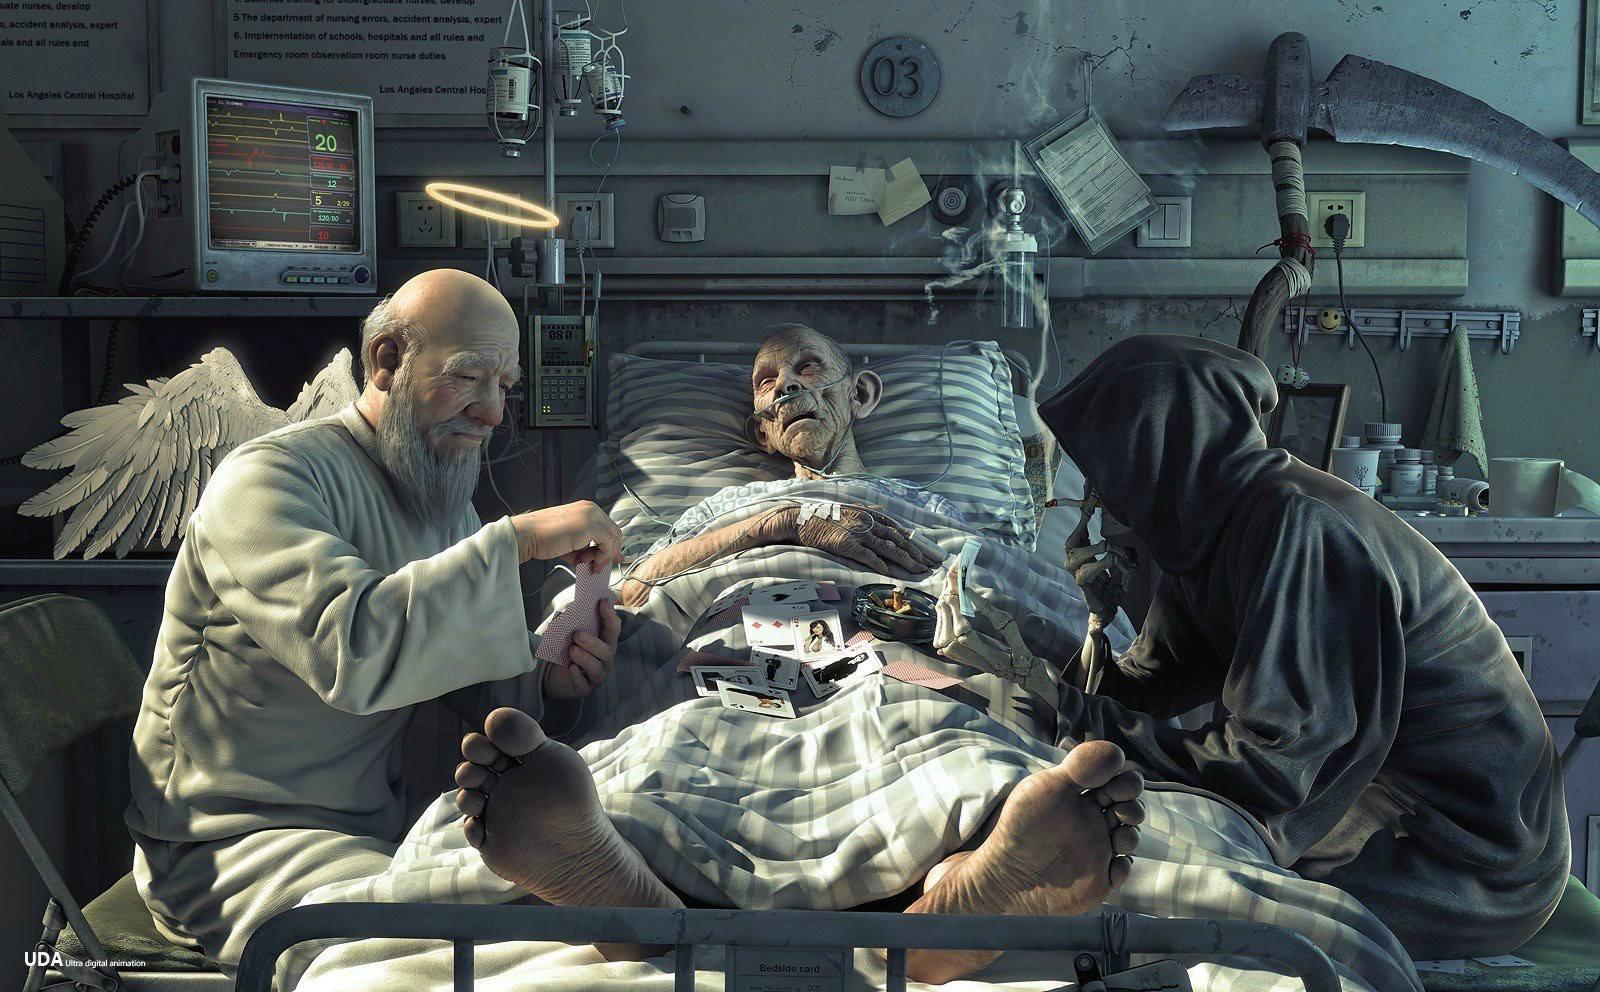 General 1600x992 hospital angel death digital art Grim Reaper cards